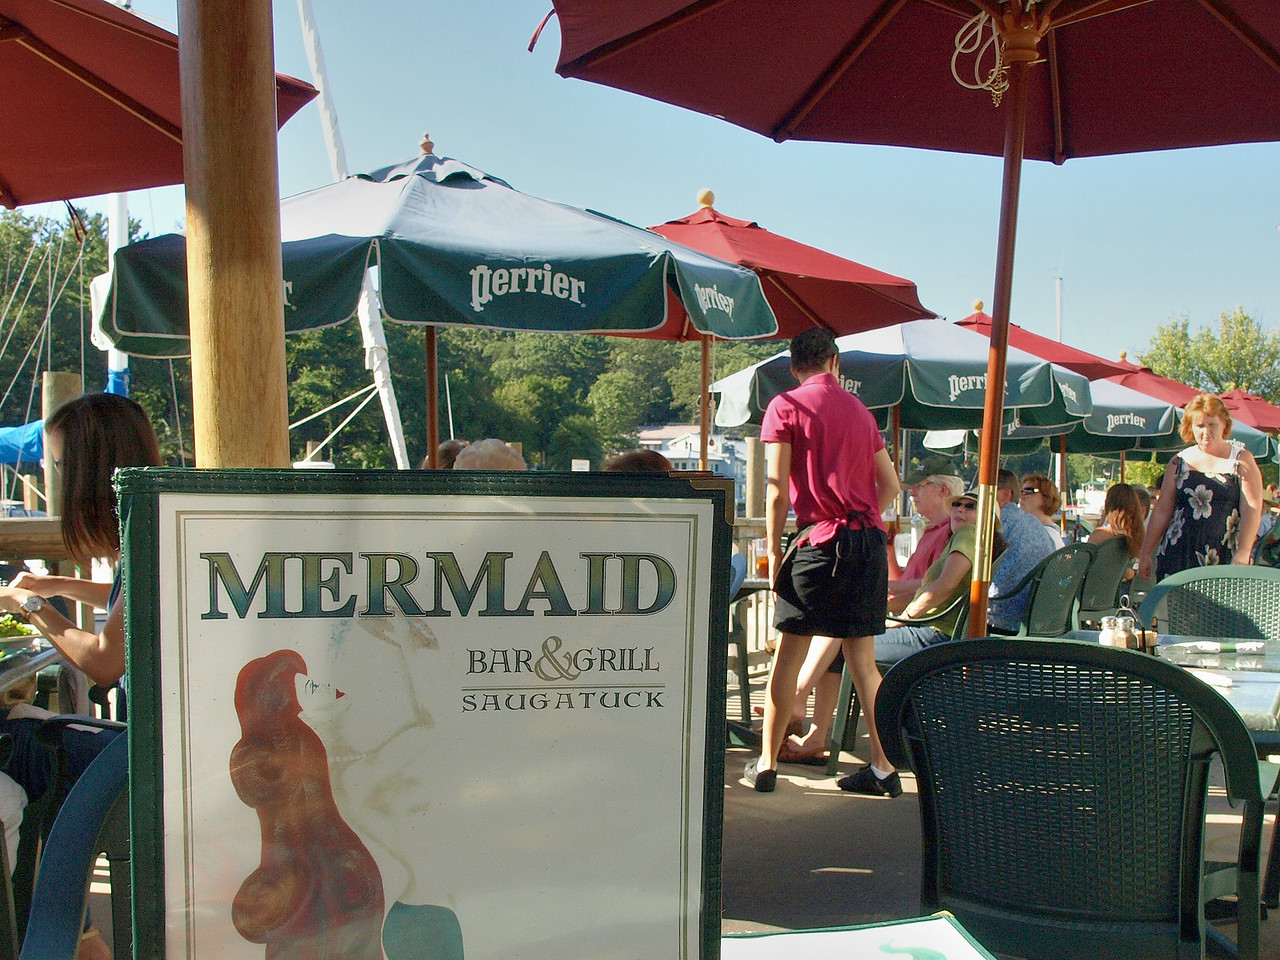 Mermaid Bar & Grill